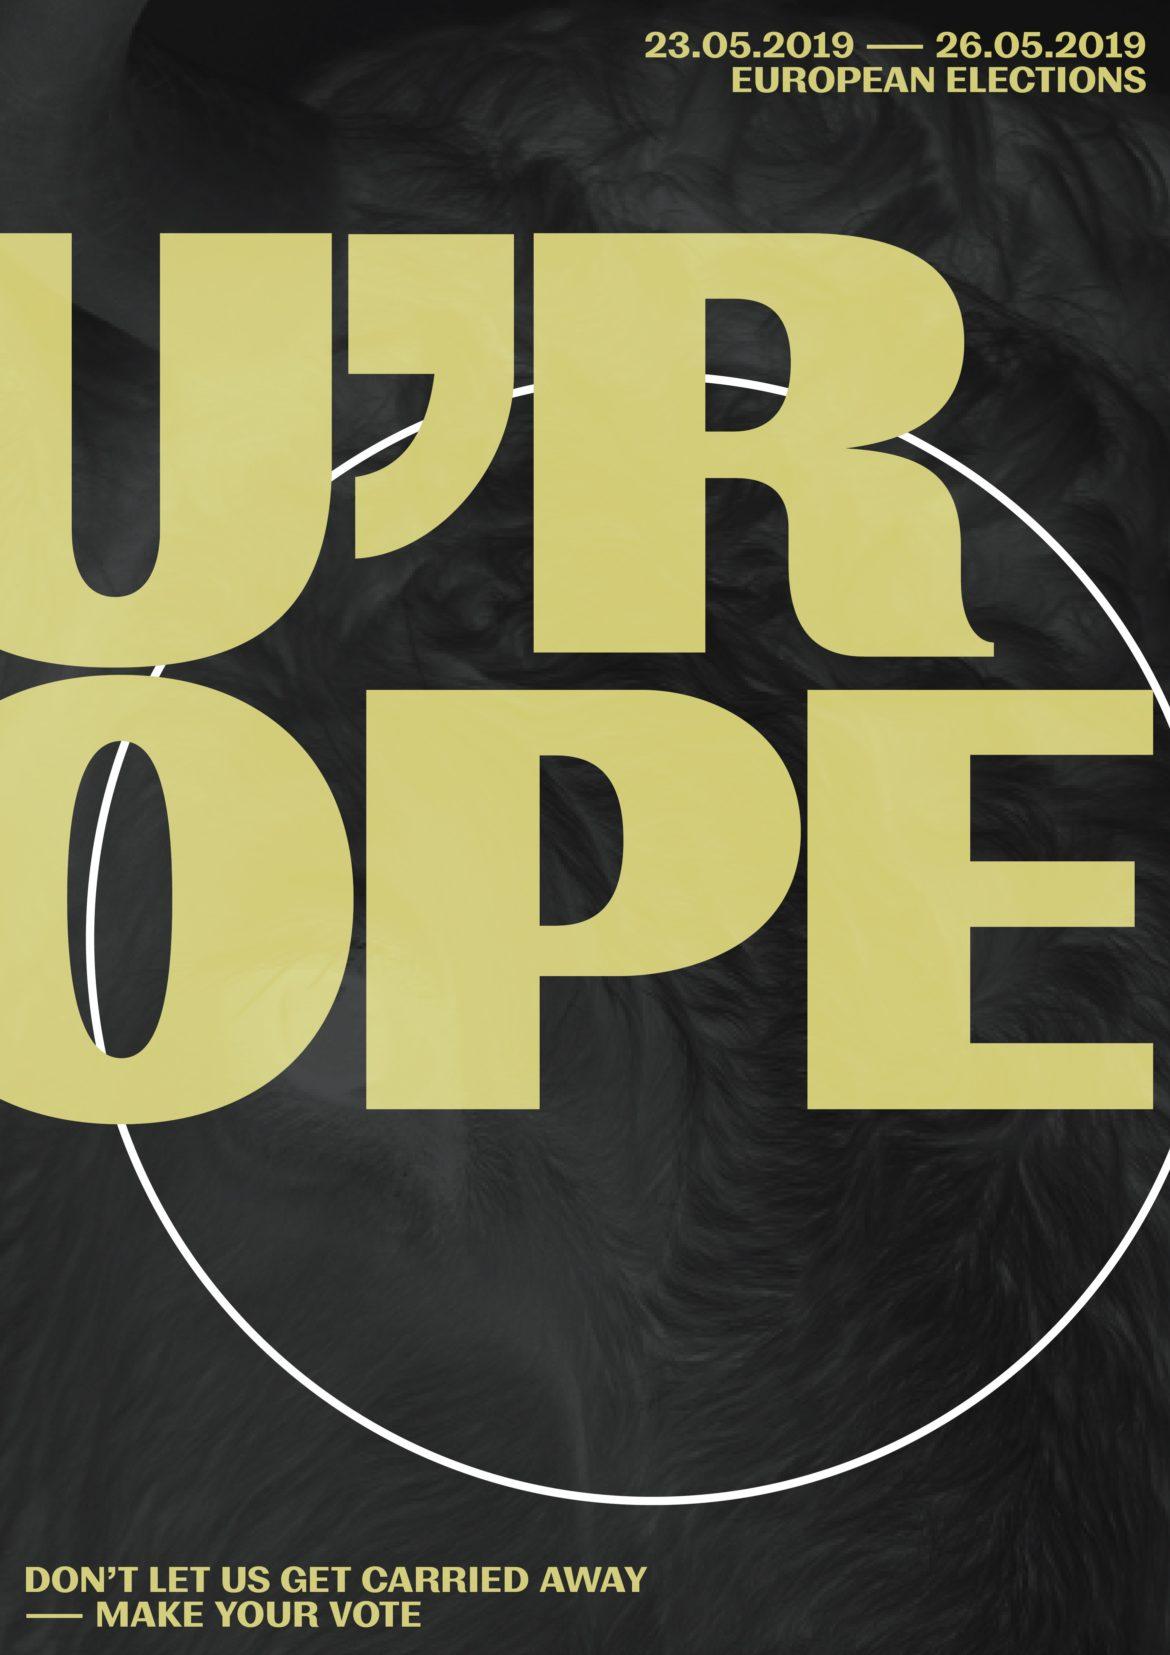 European Elections | Europawahl | Poster Design | Typografie